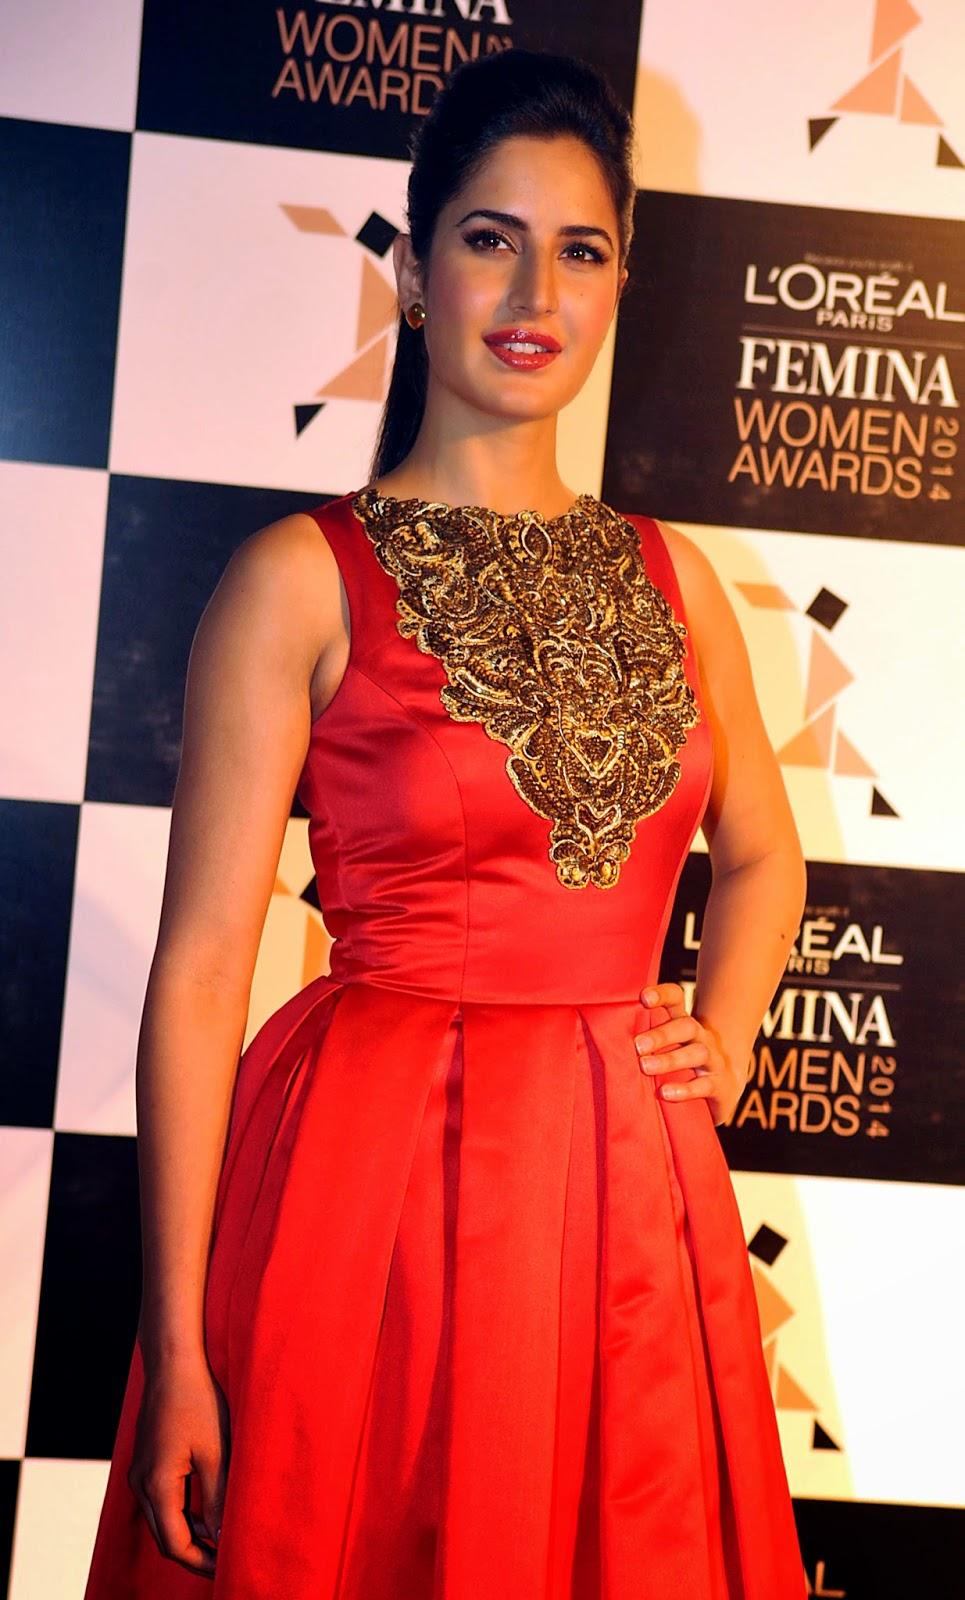 Katrina Kaif HD Images | HD Wallpapers of Bollywood Barbie Doll